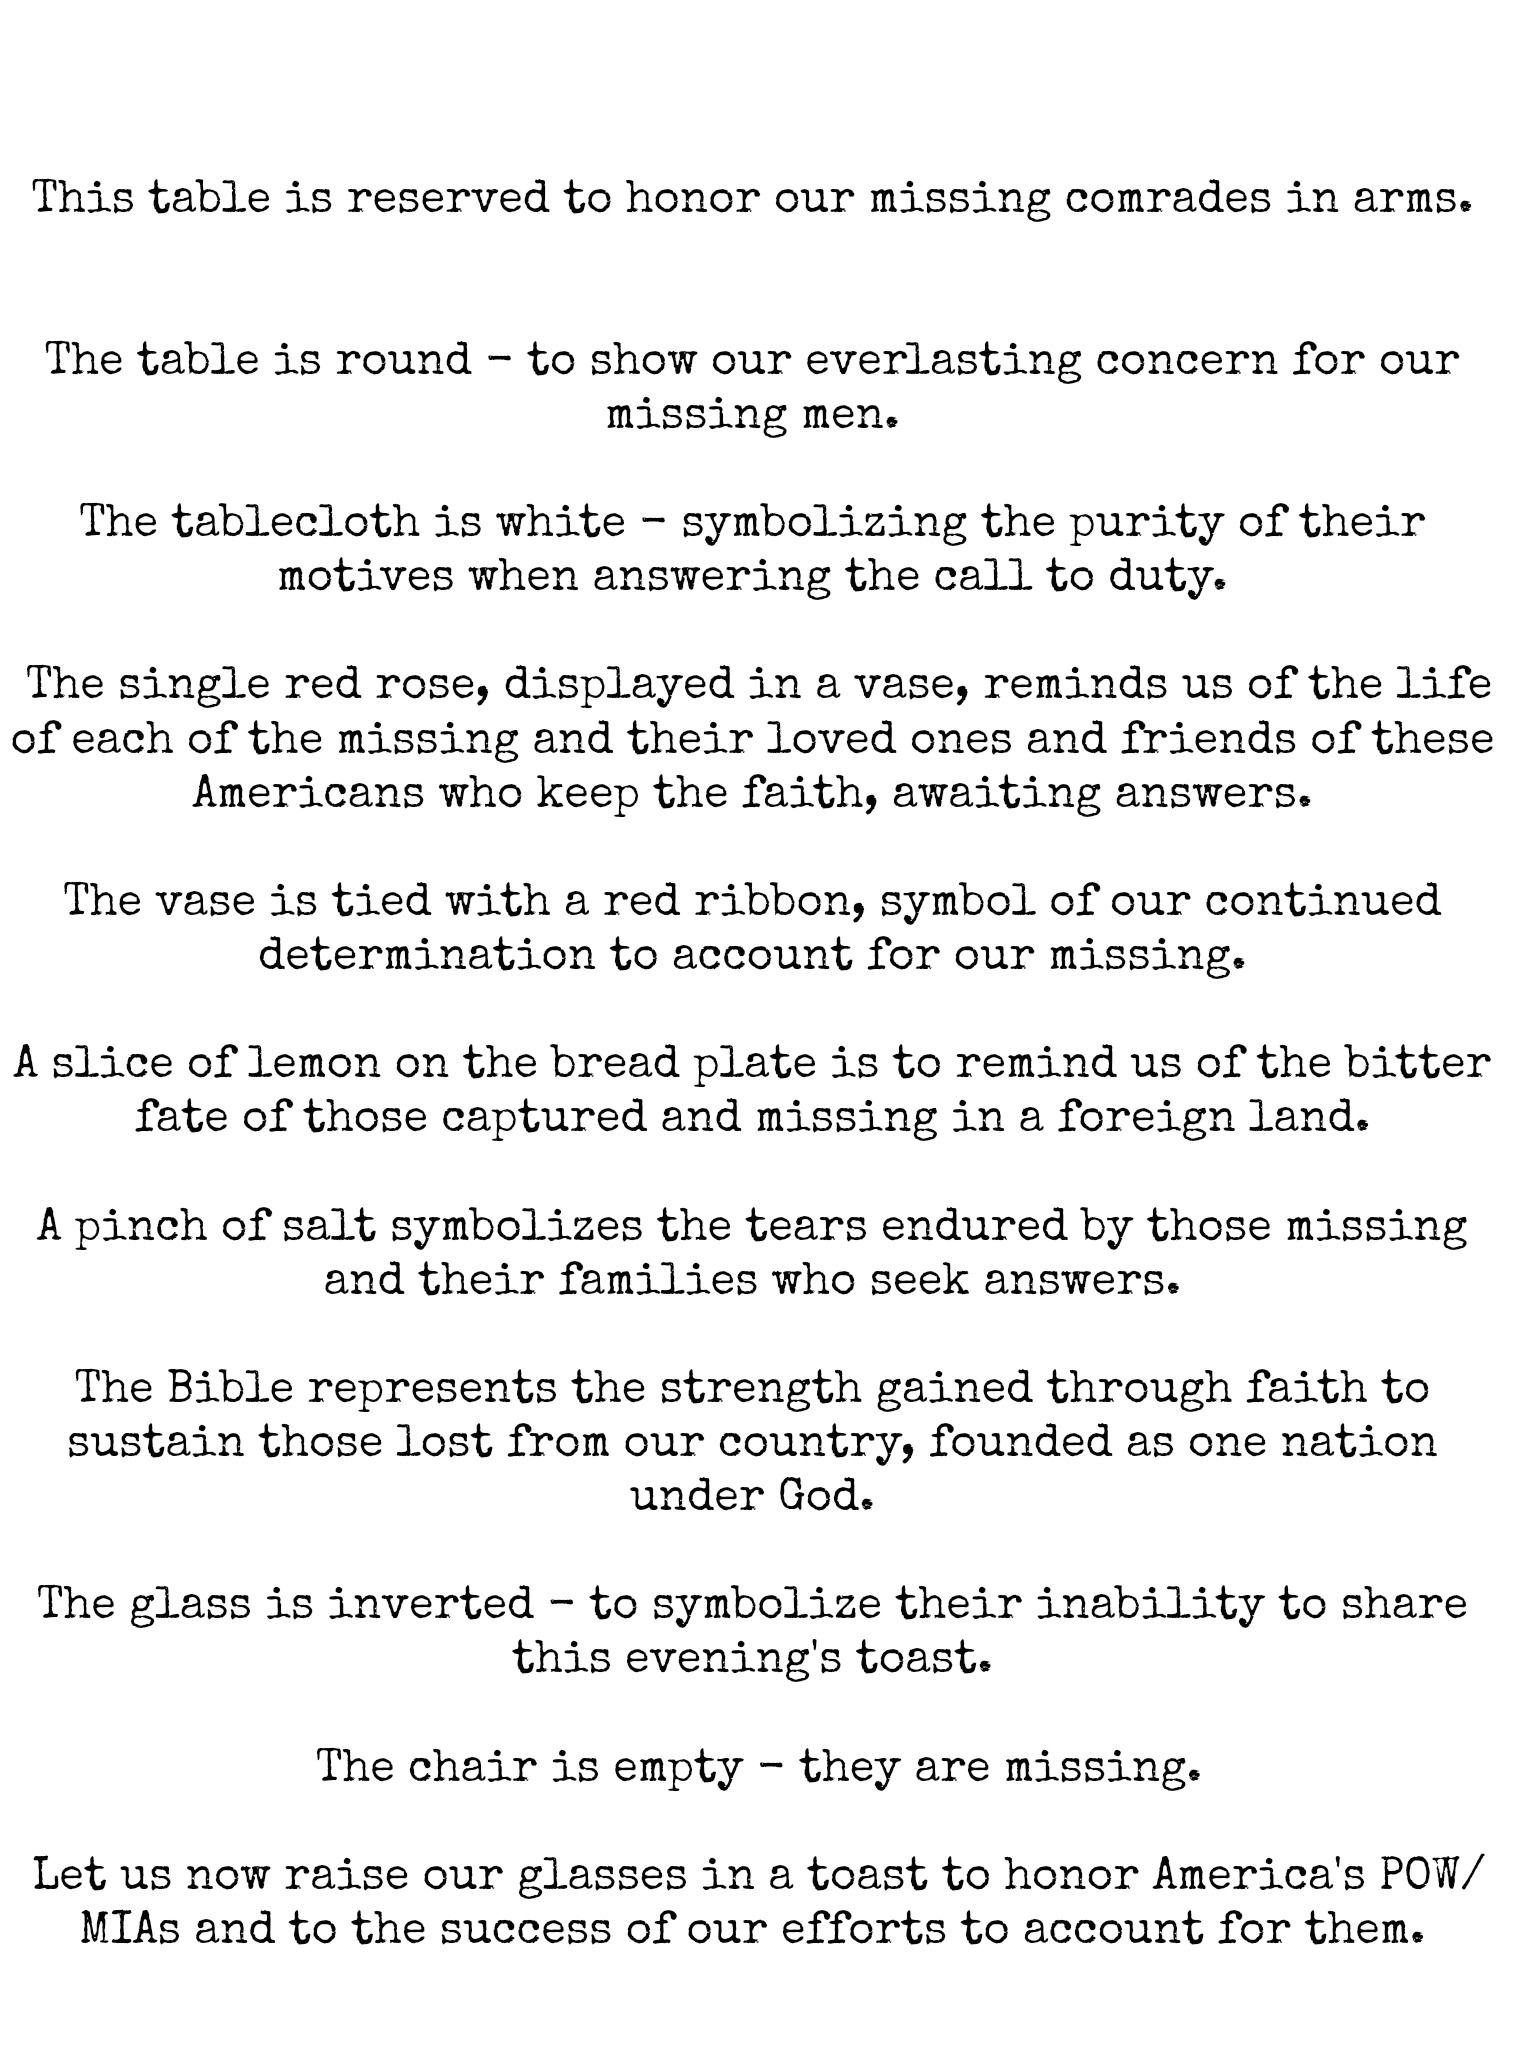 Fallen Comrade Table Poem Www Microfinanceindia Org